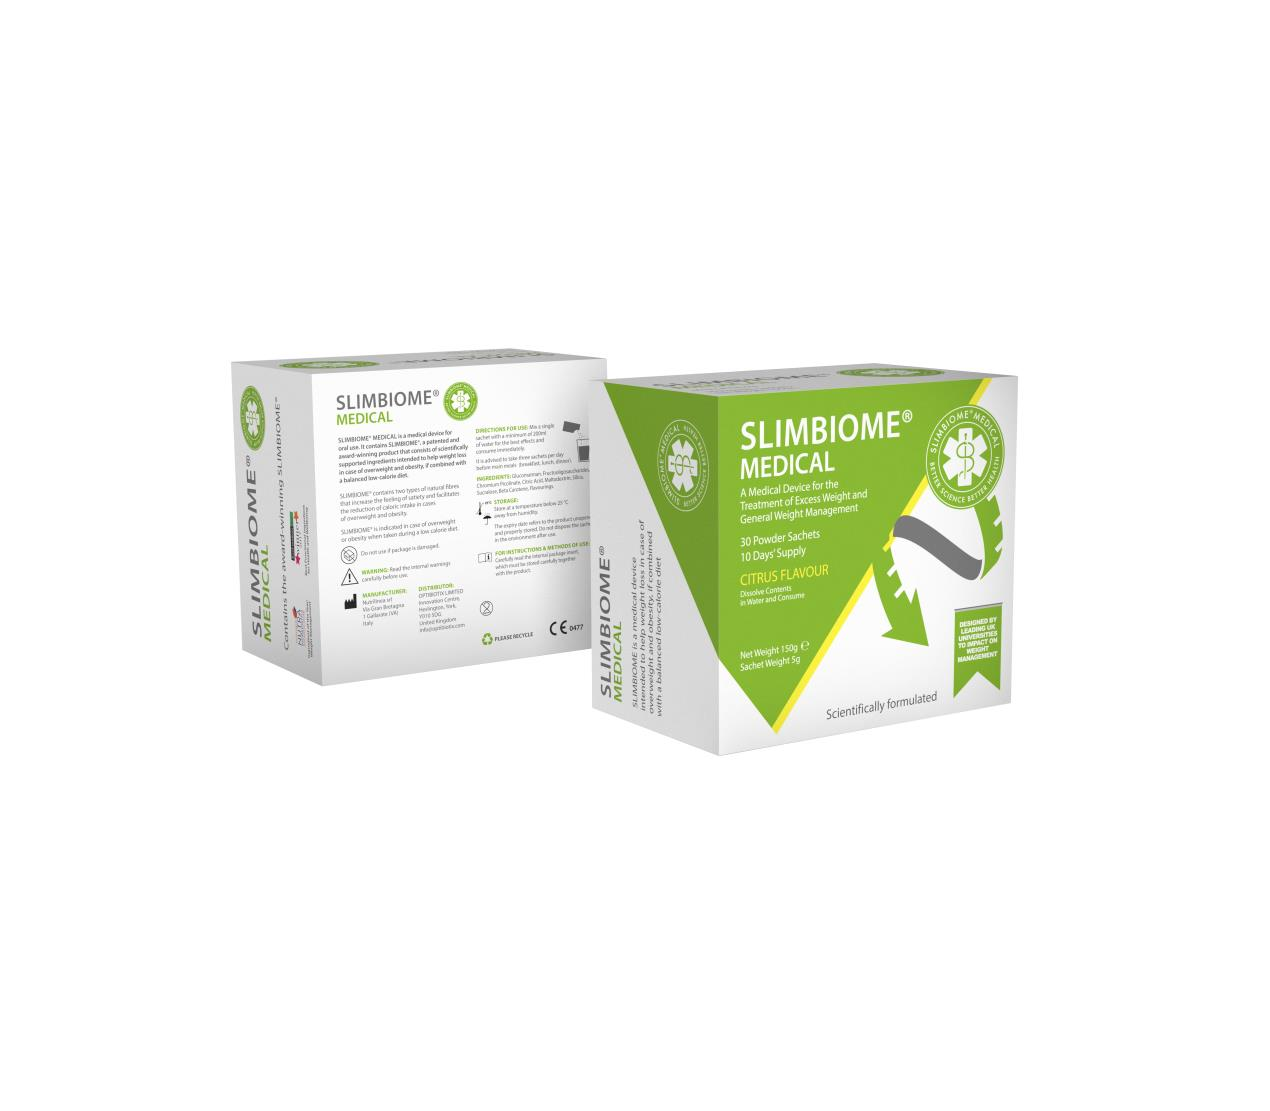 SlimBiome Medical Box